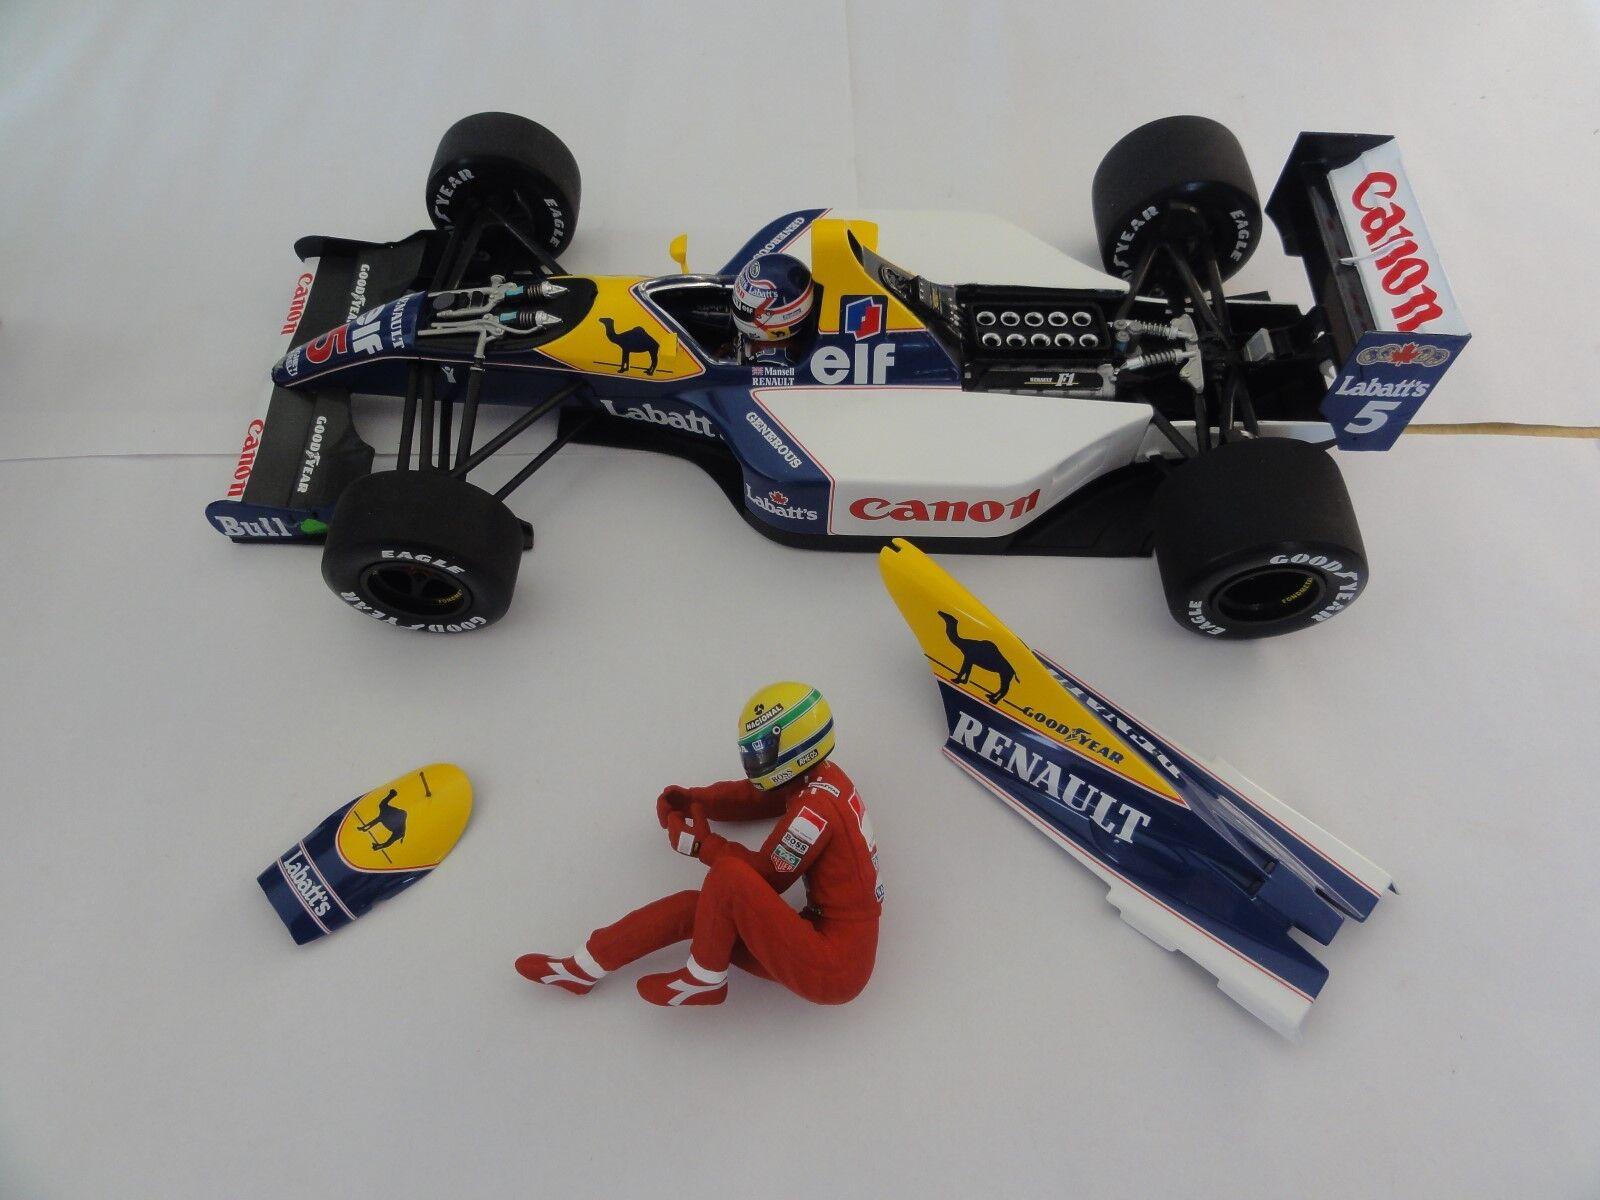 MINICHAMPS F1 1 18 Williams FW14 Senna Mansell Taxi British GP 1991 VERY RARE